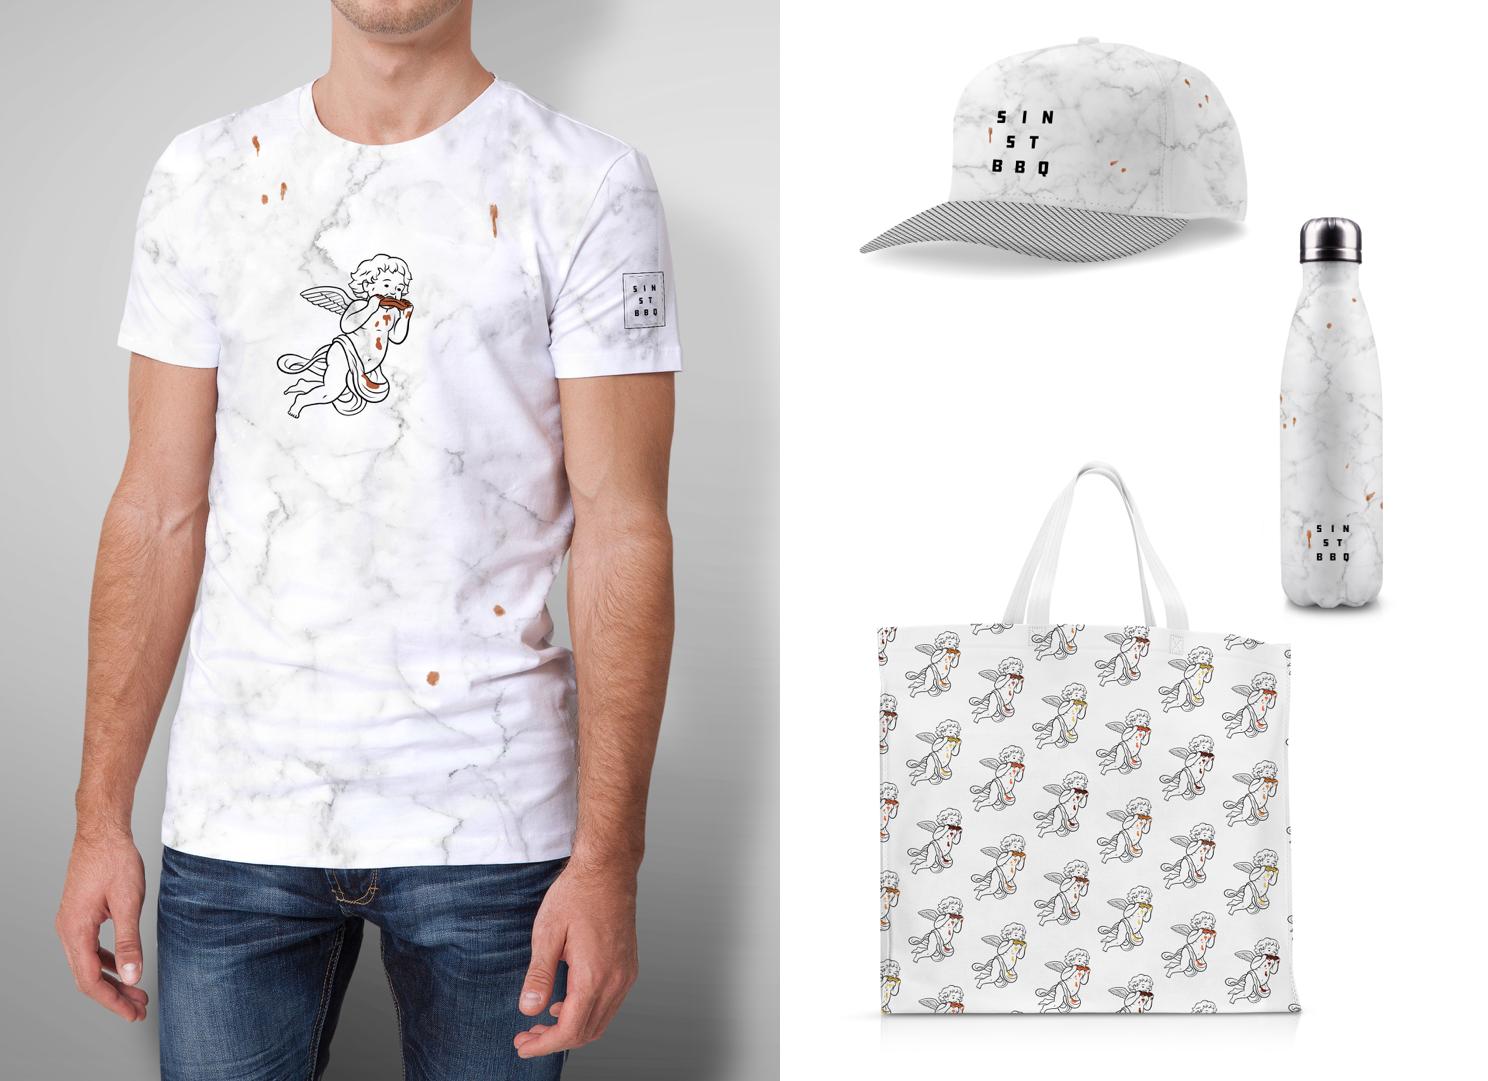 sinstbbq_apparel